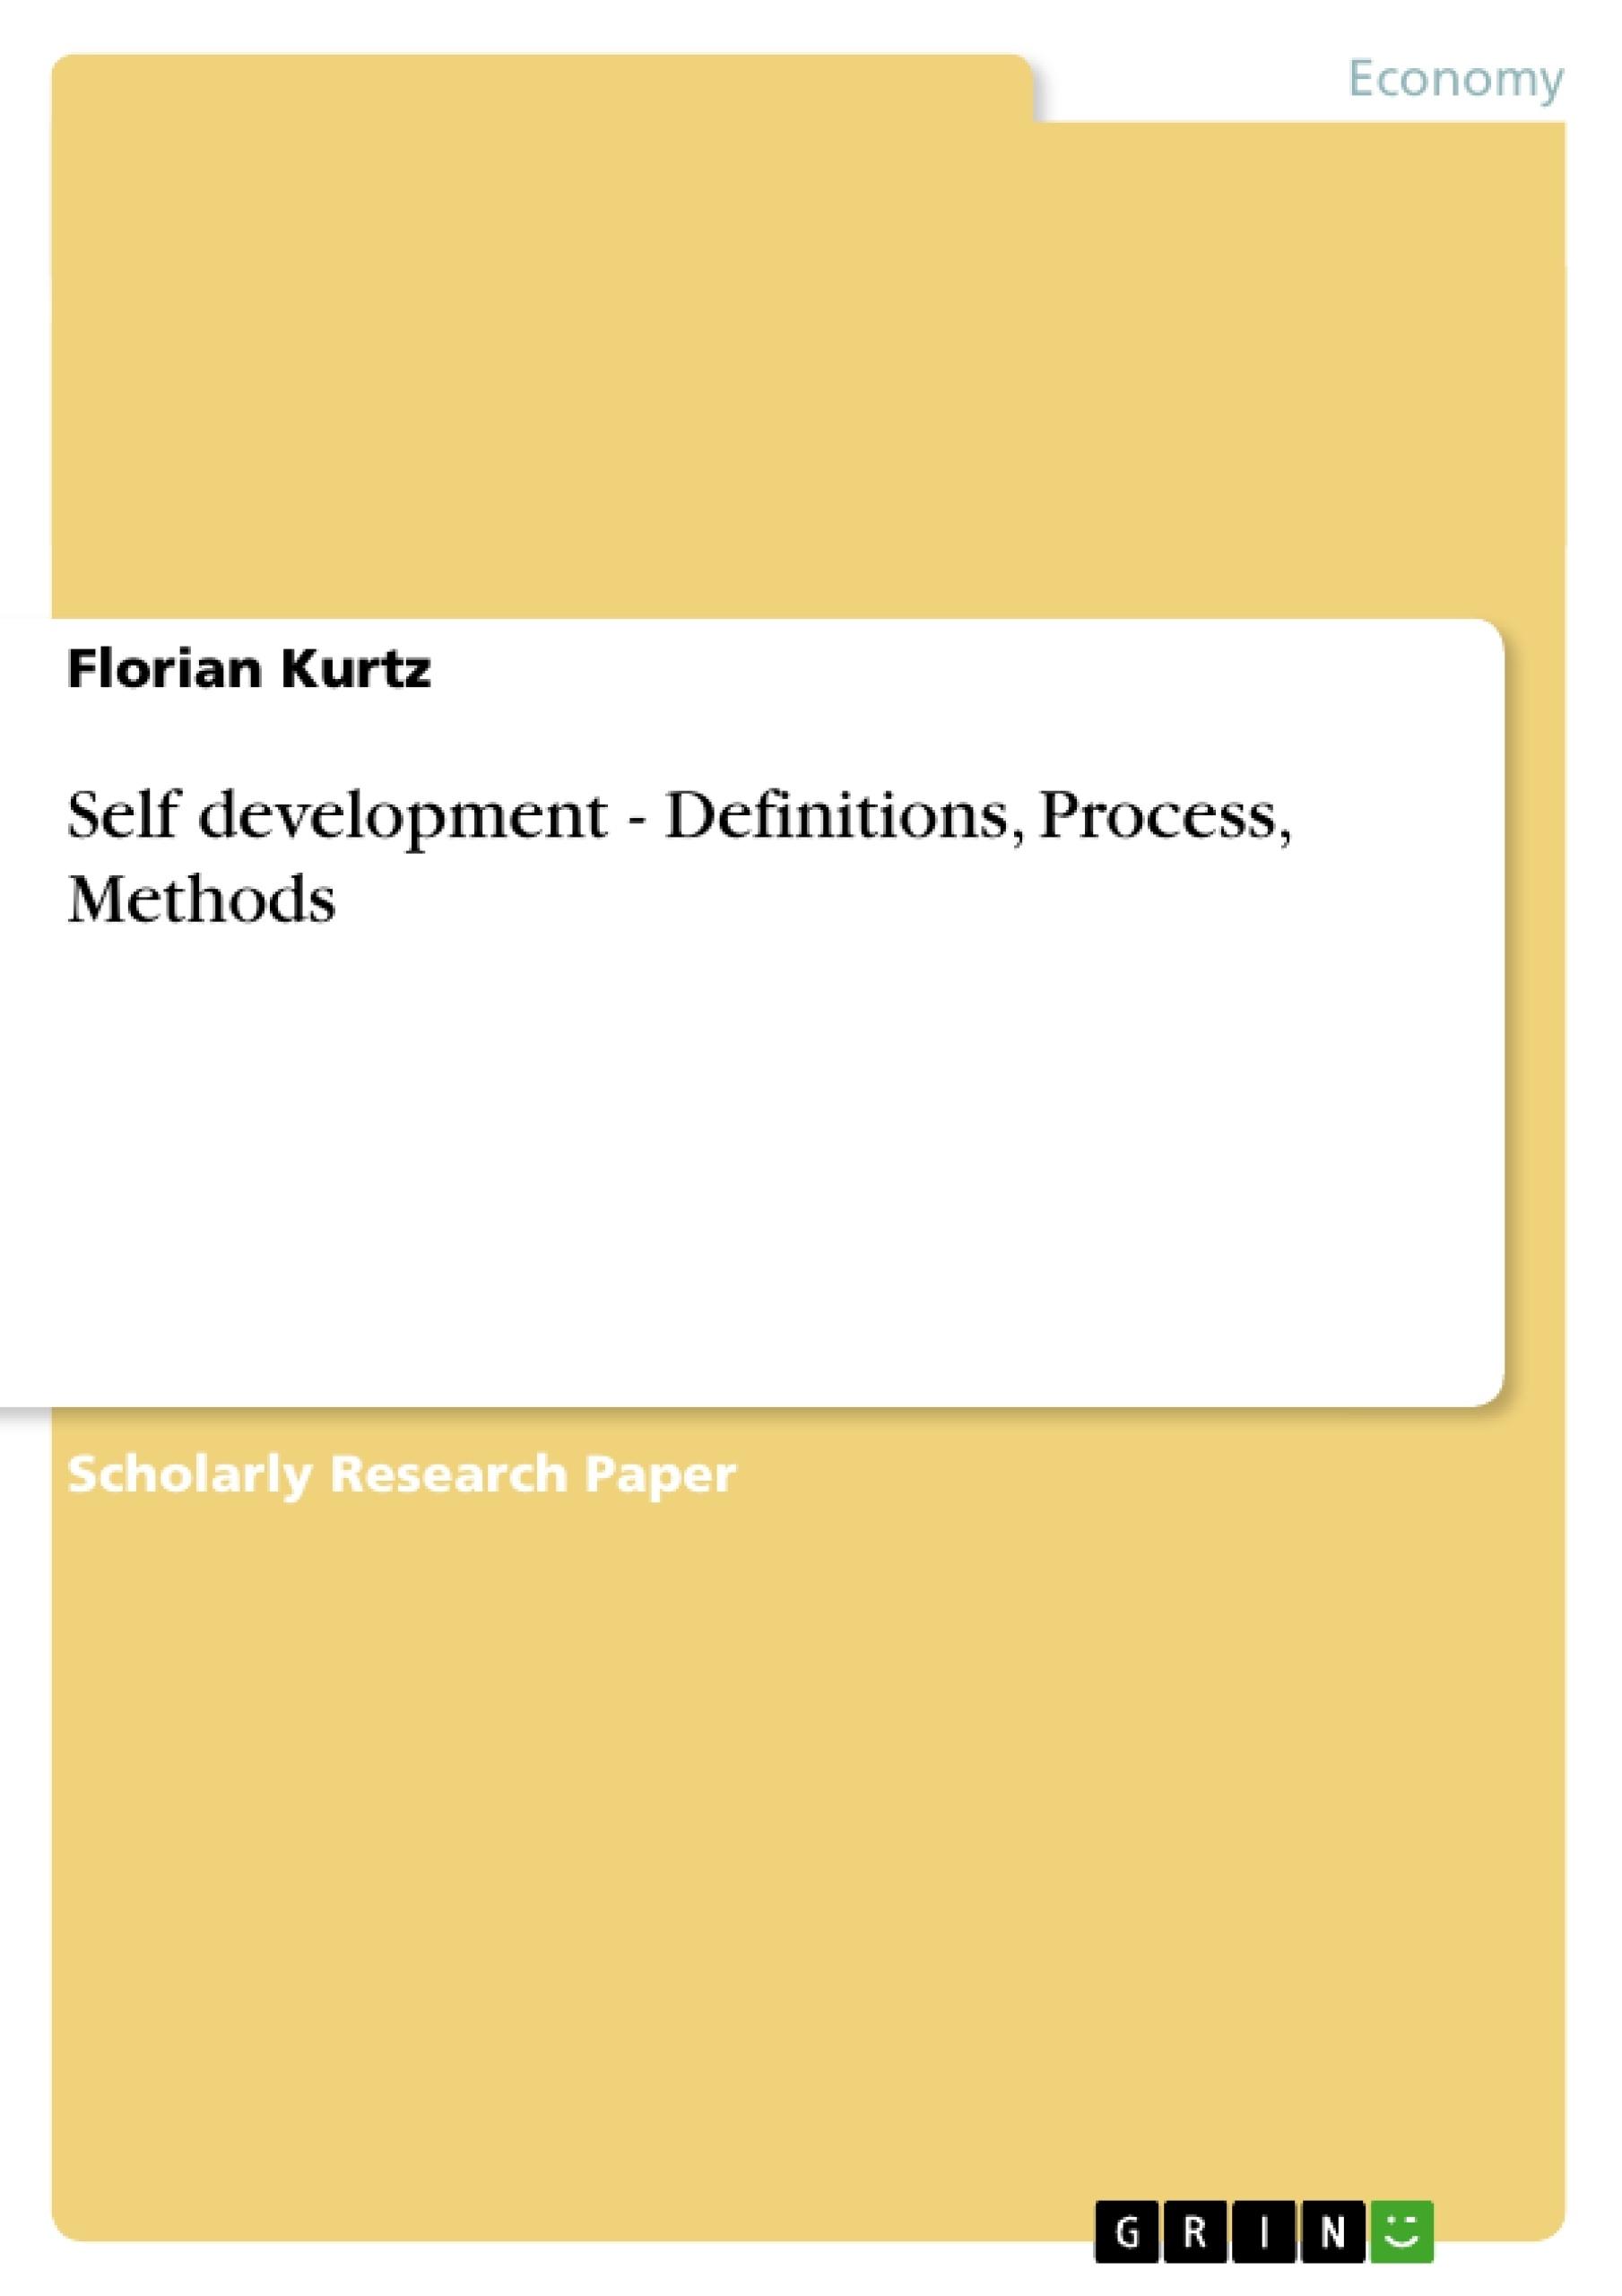 Title: Self development - Definitions, Process, Methods